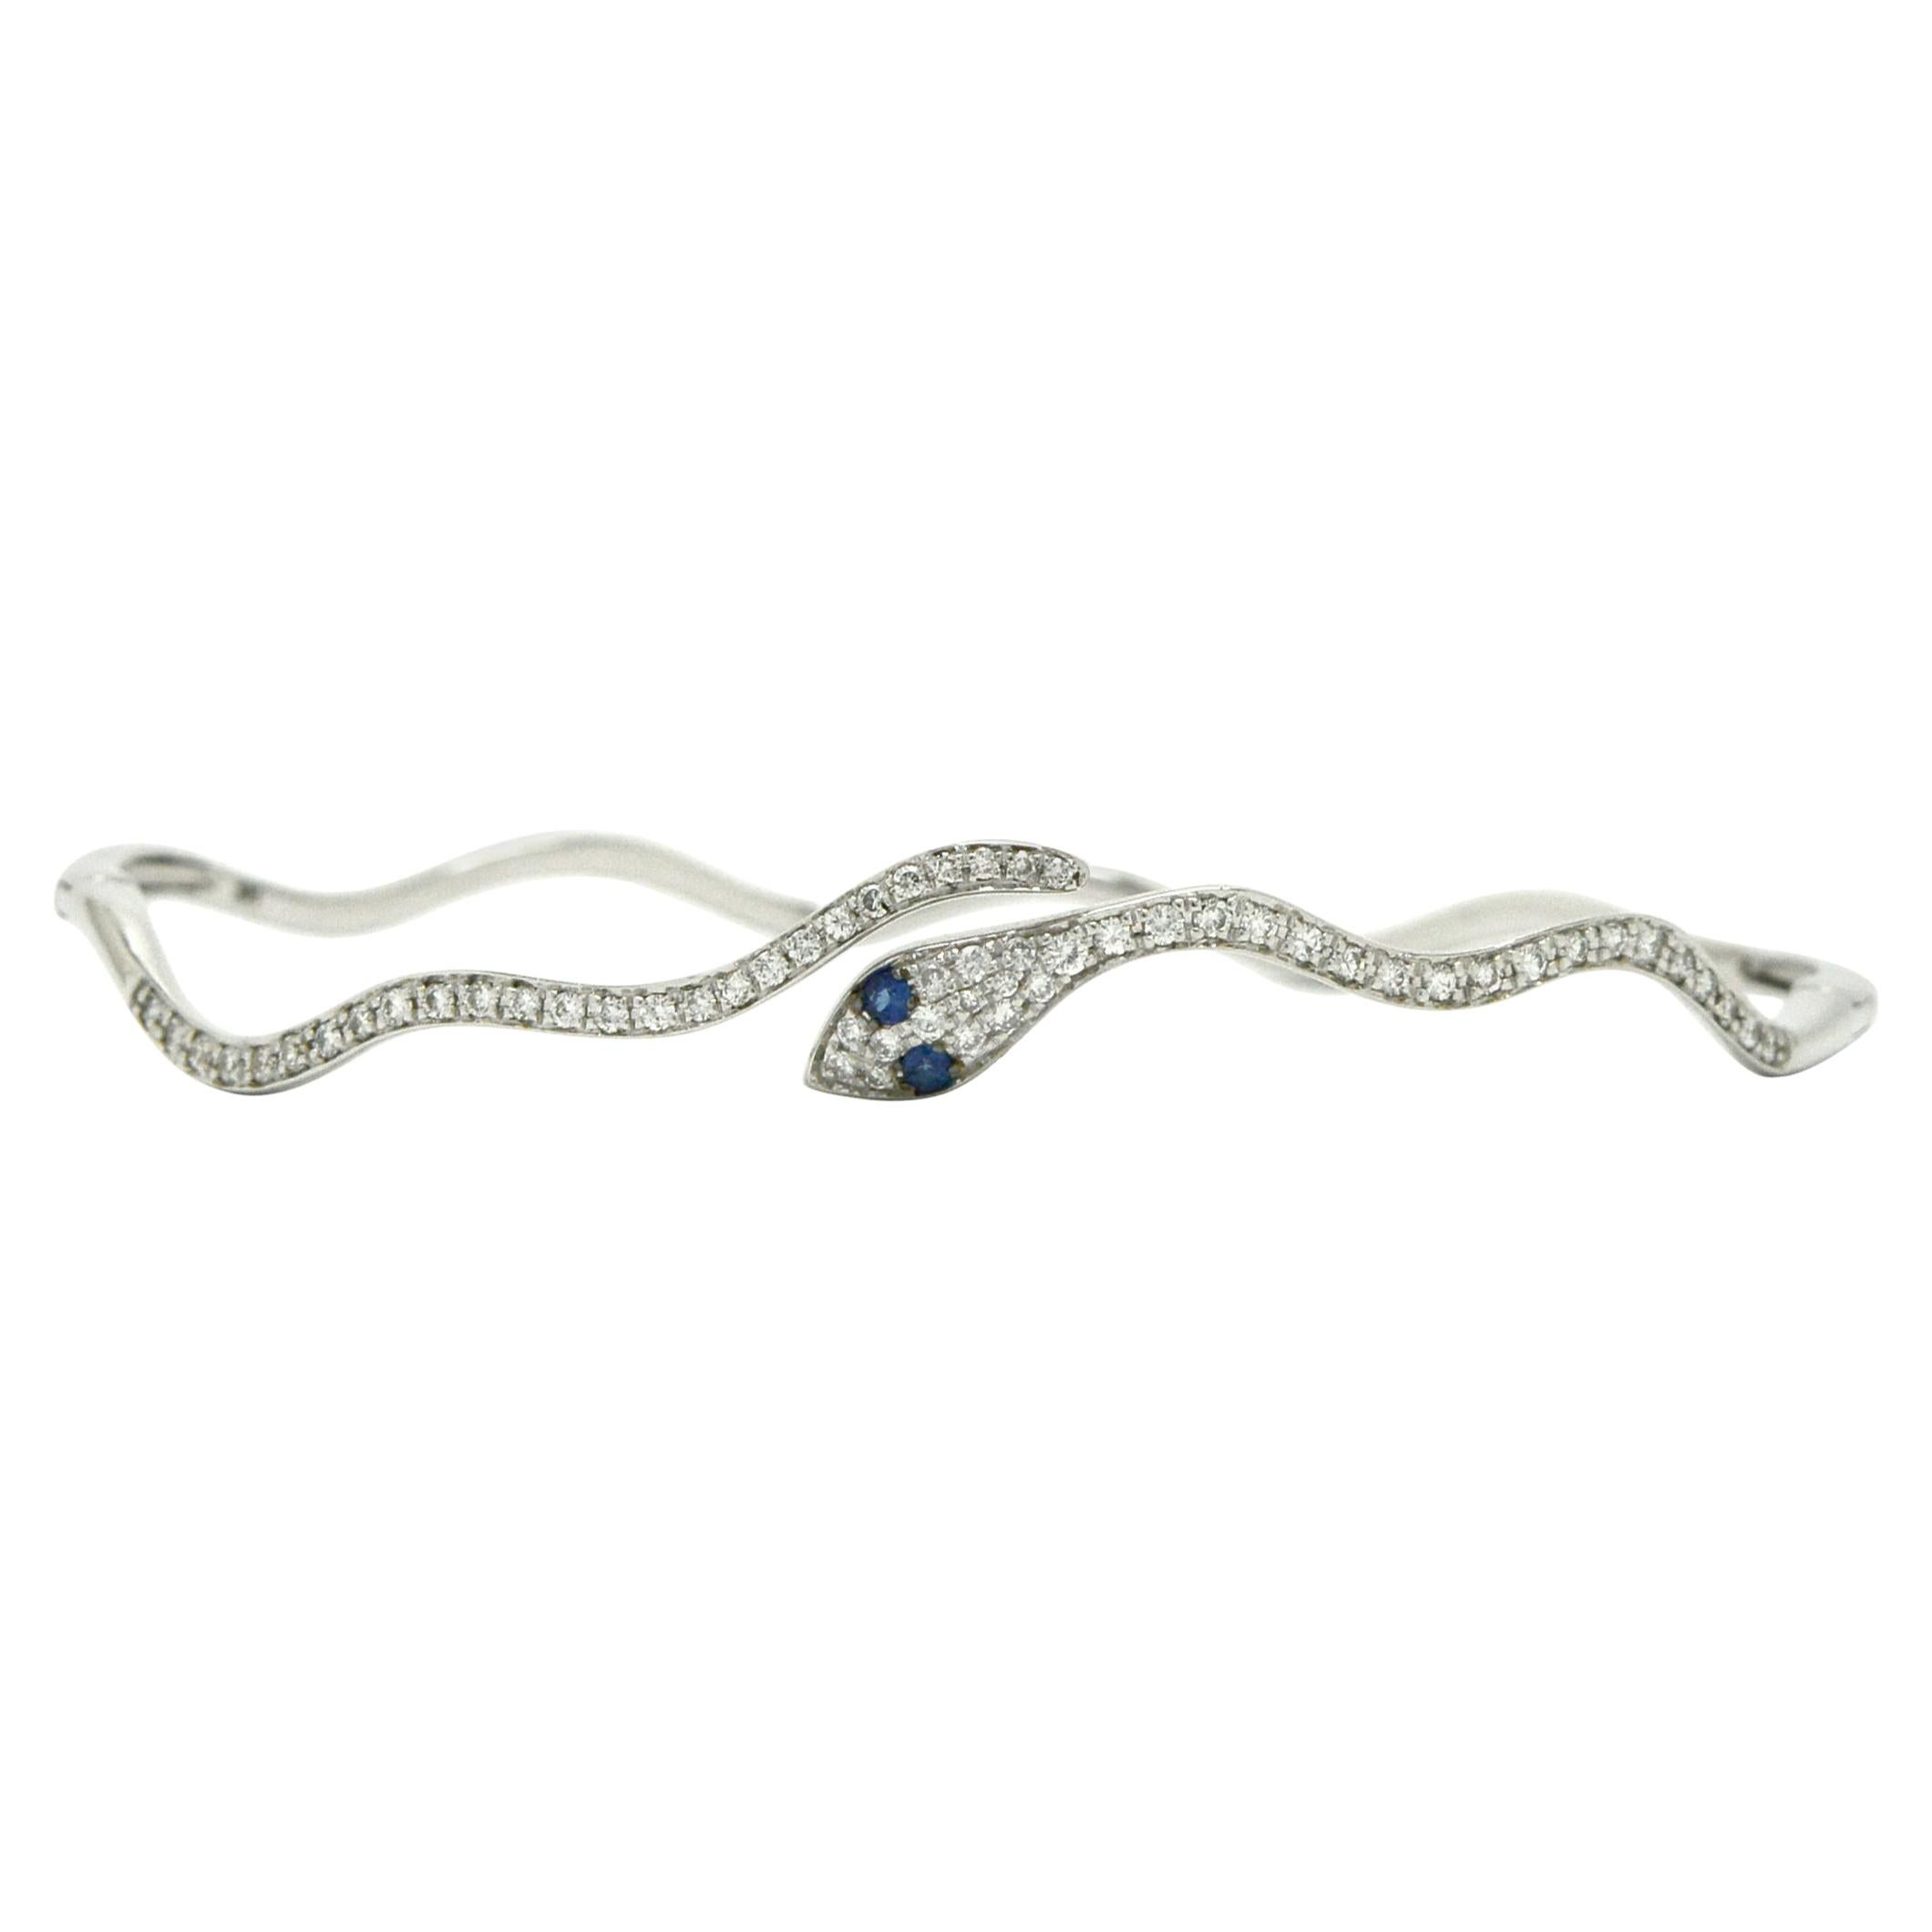 Egyptian Revival Pave' Diamond Snake Bangle Bracelet Cuff Blue Sapphire Eyes